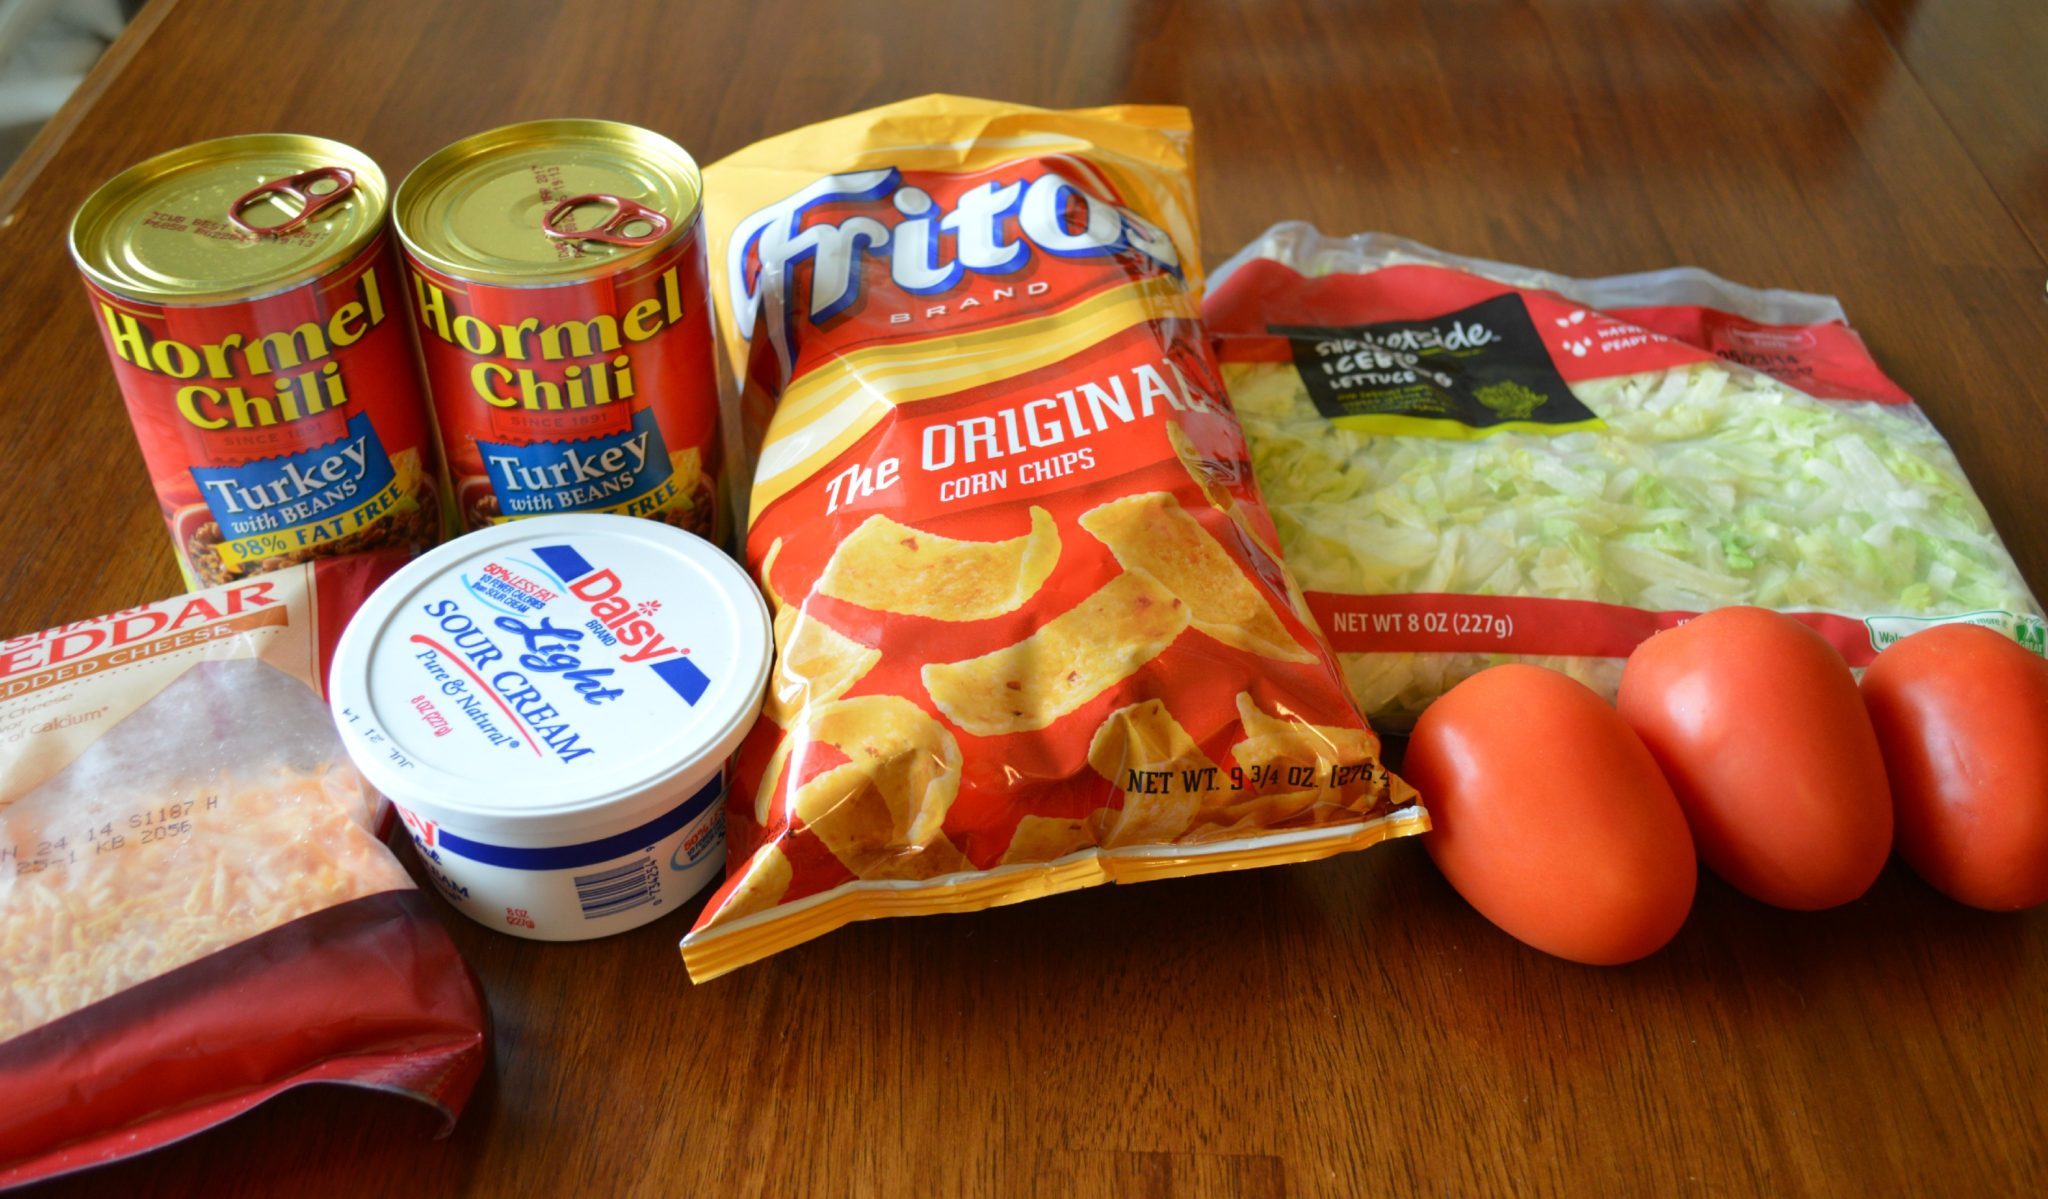 https://joyfulhomemaking.com/2014/05/corn-chip-chili-bowl.html